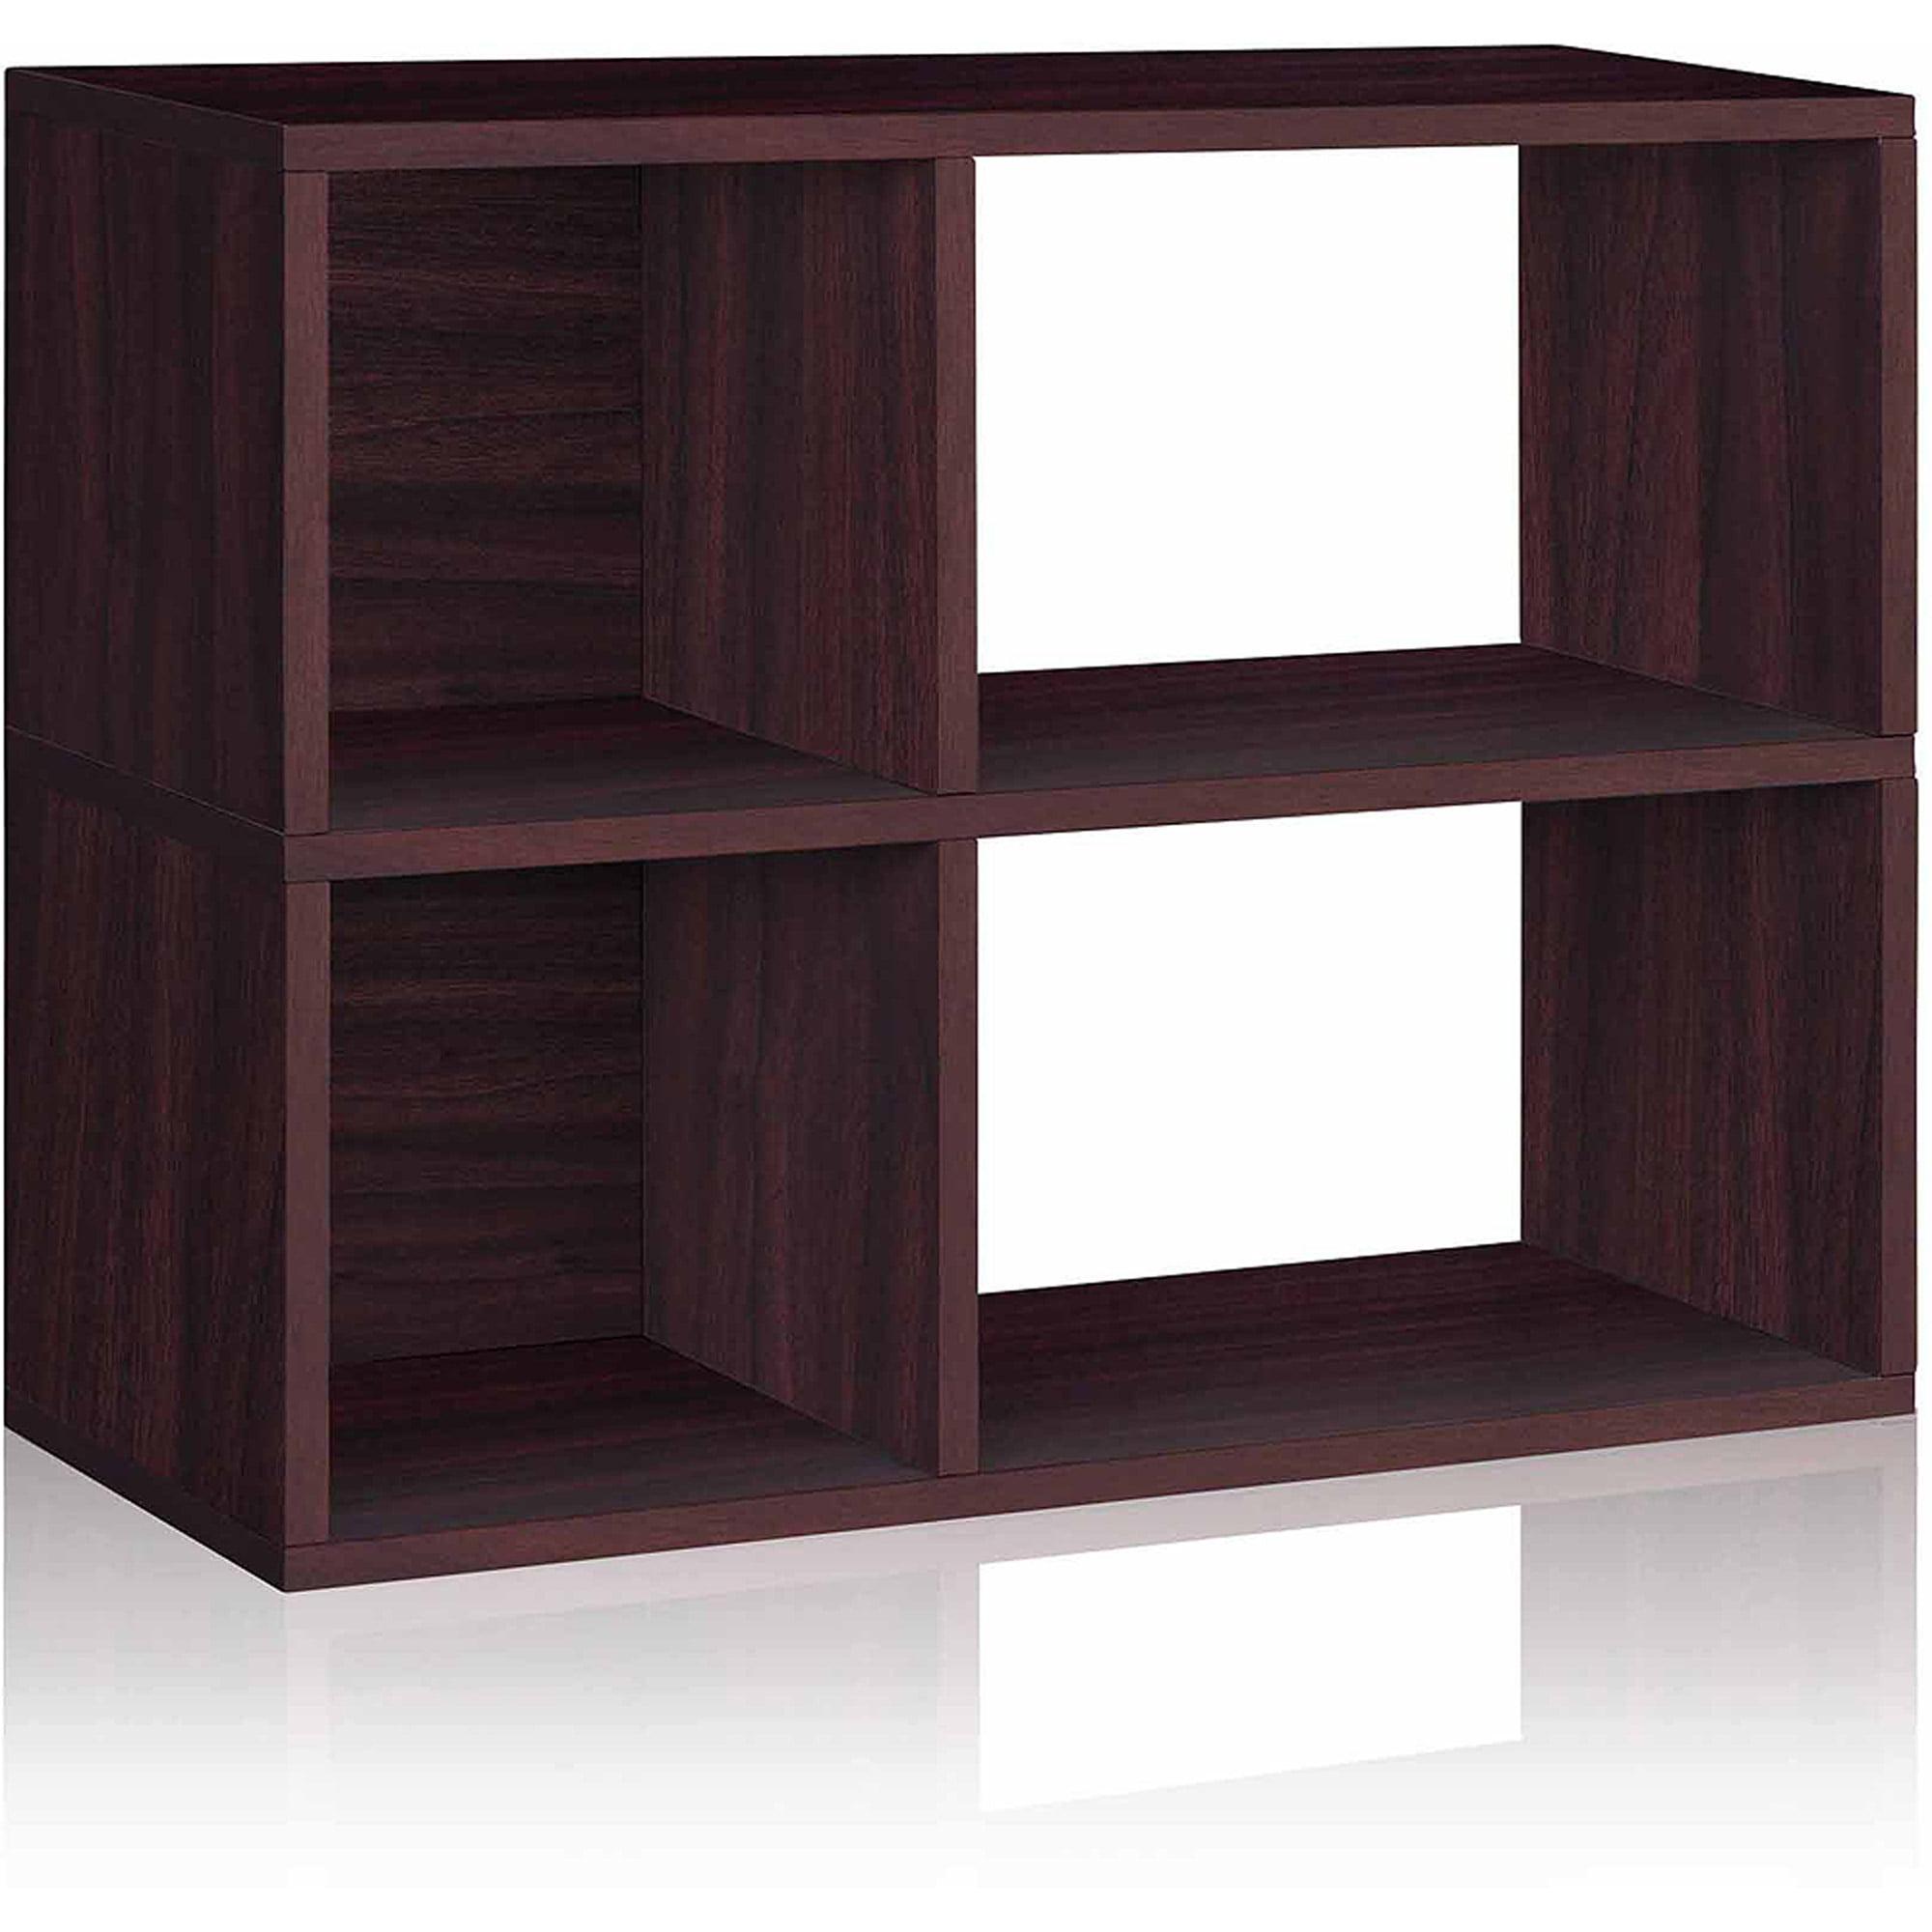 Way Basics Eco 2-Shelf Chelsea Bookcase and Cubby Storage, Espresso